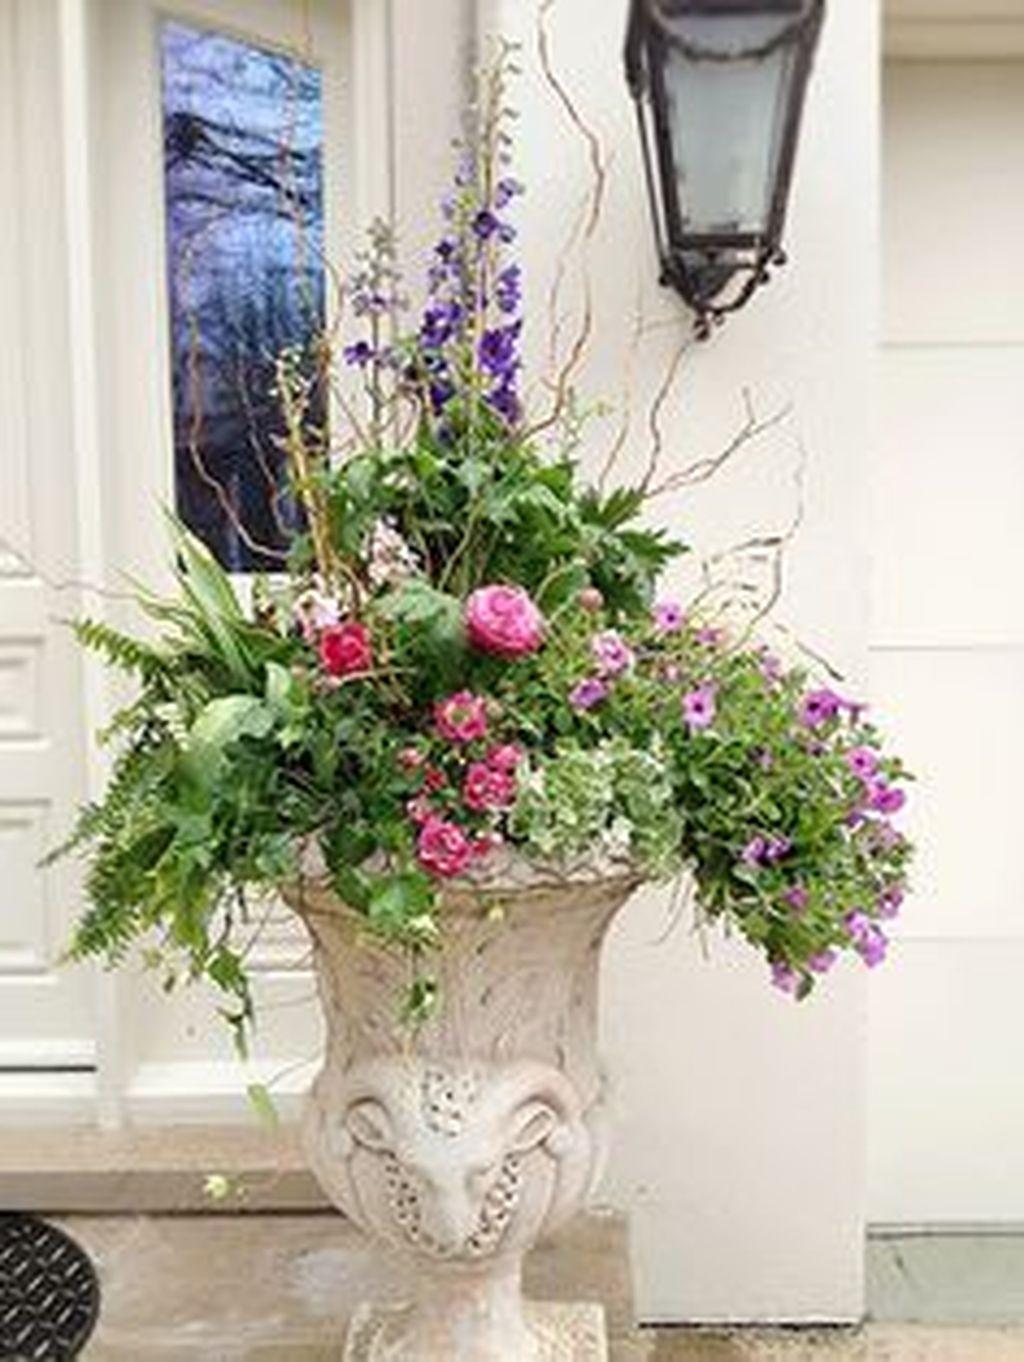 Inspiring Spring Planters Design Ideas For Front Door 25